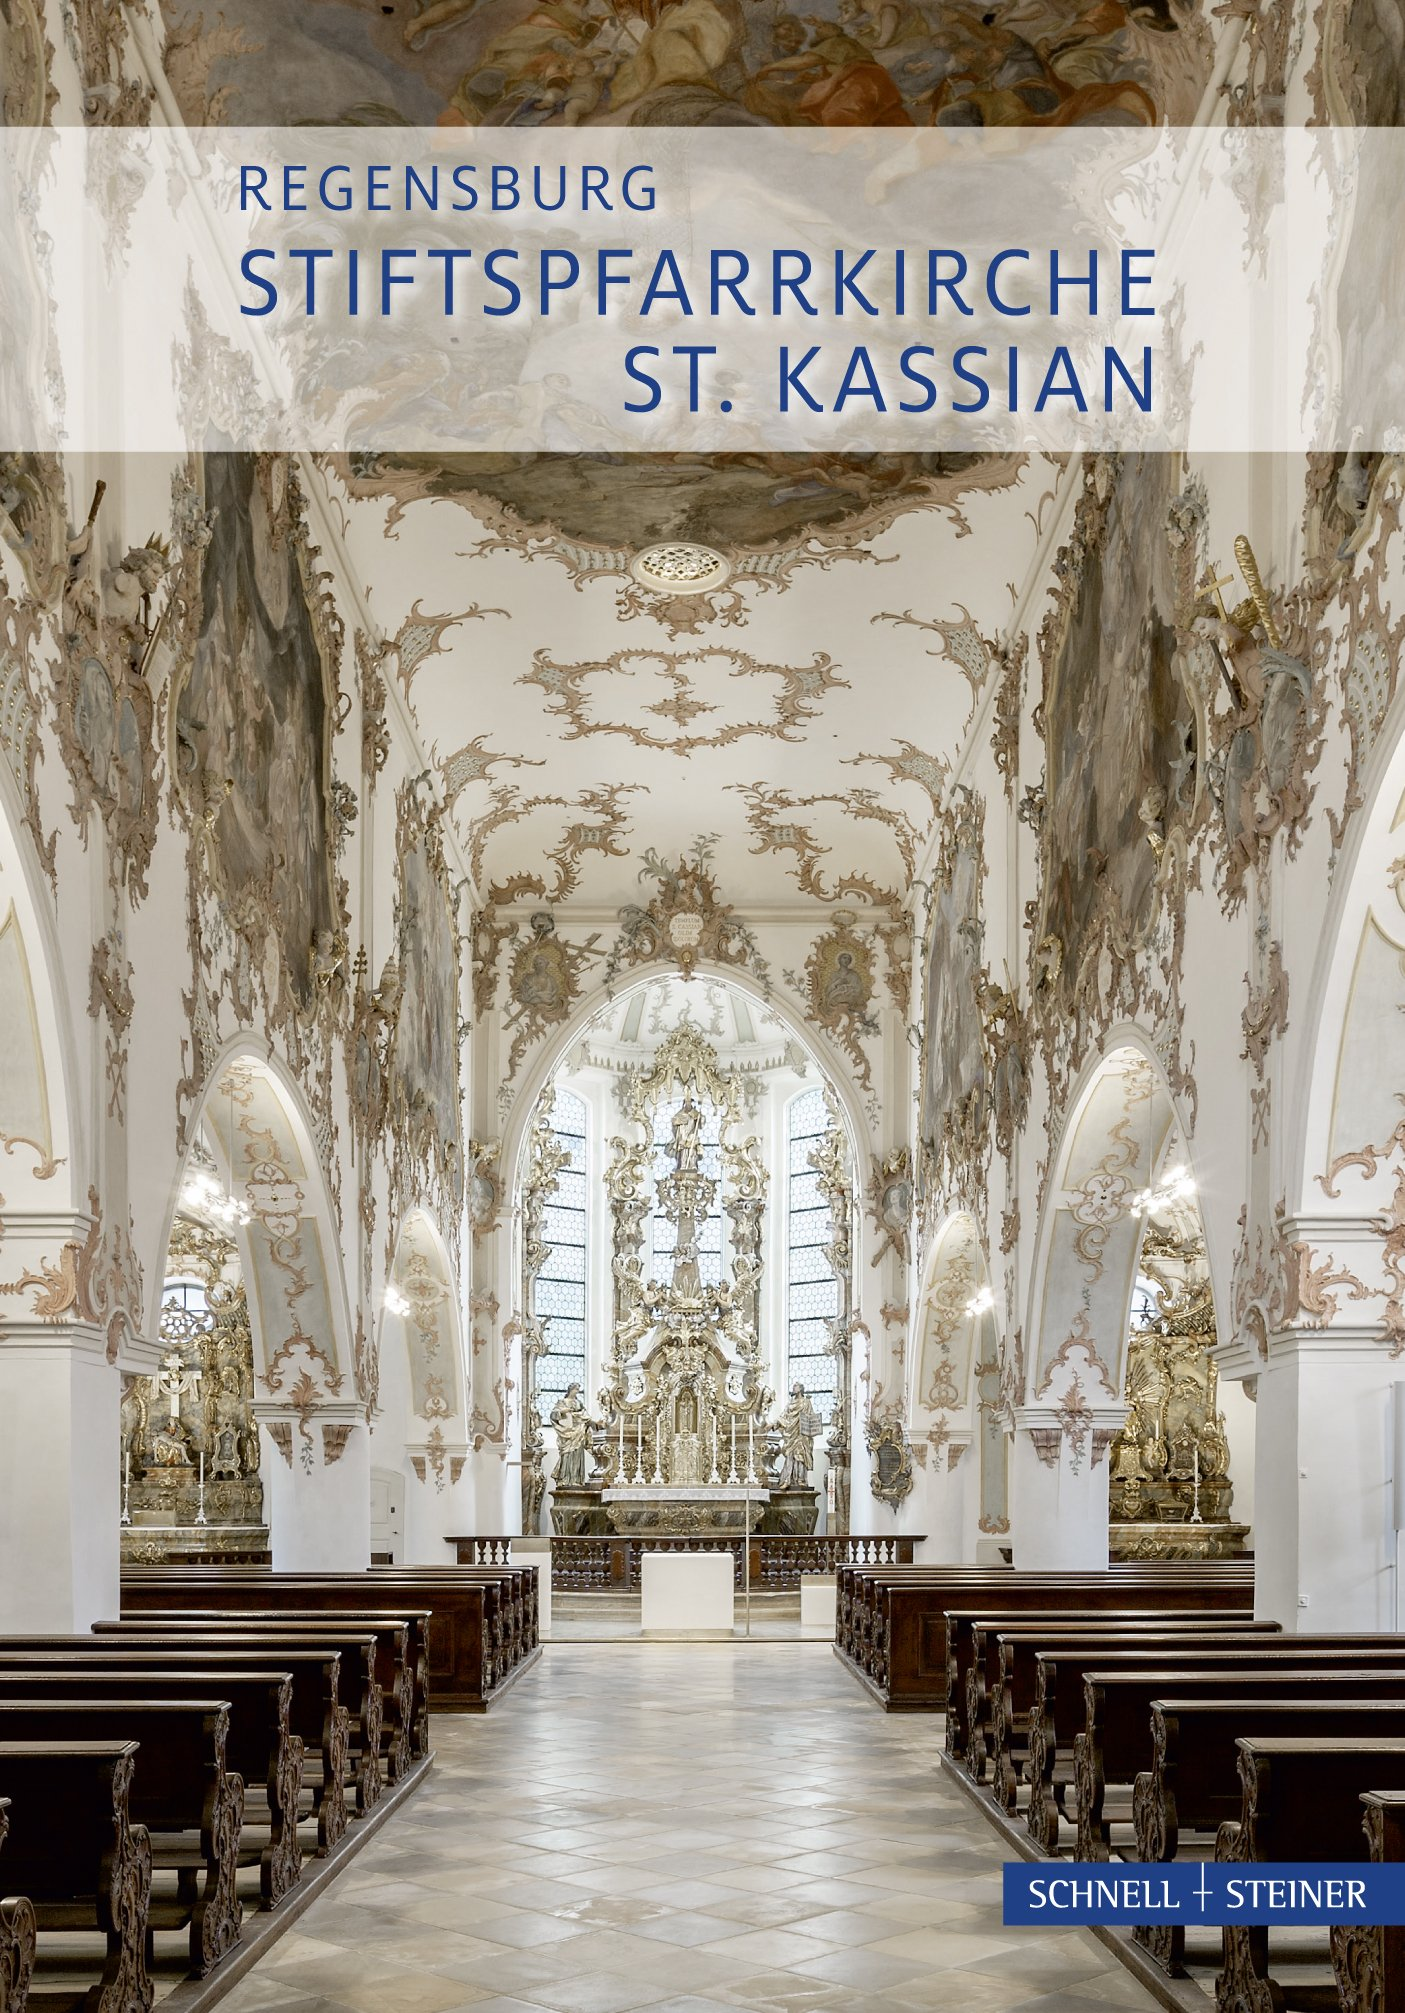 Regensburg: Stiftspfarrkirche St. Kassian